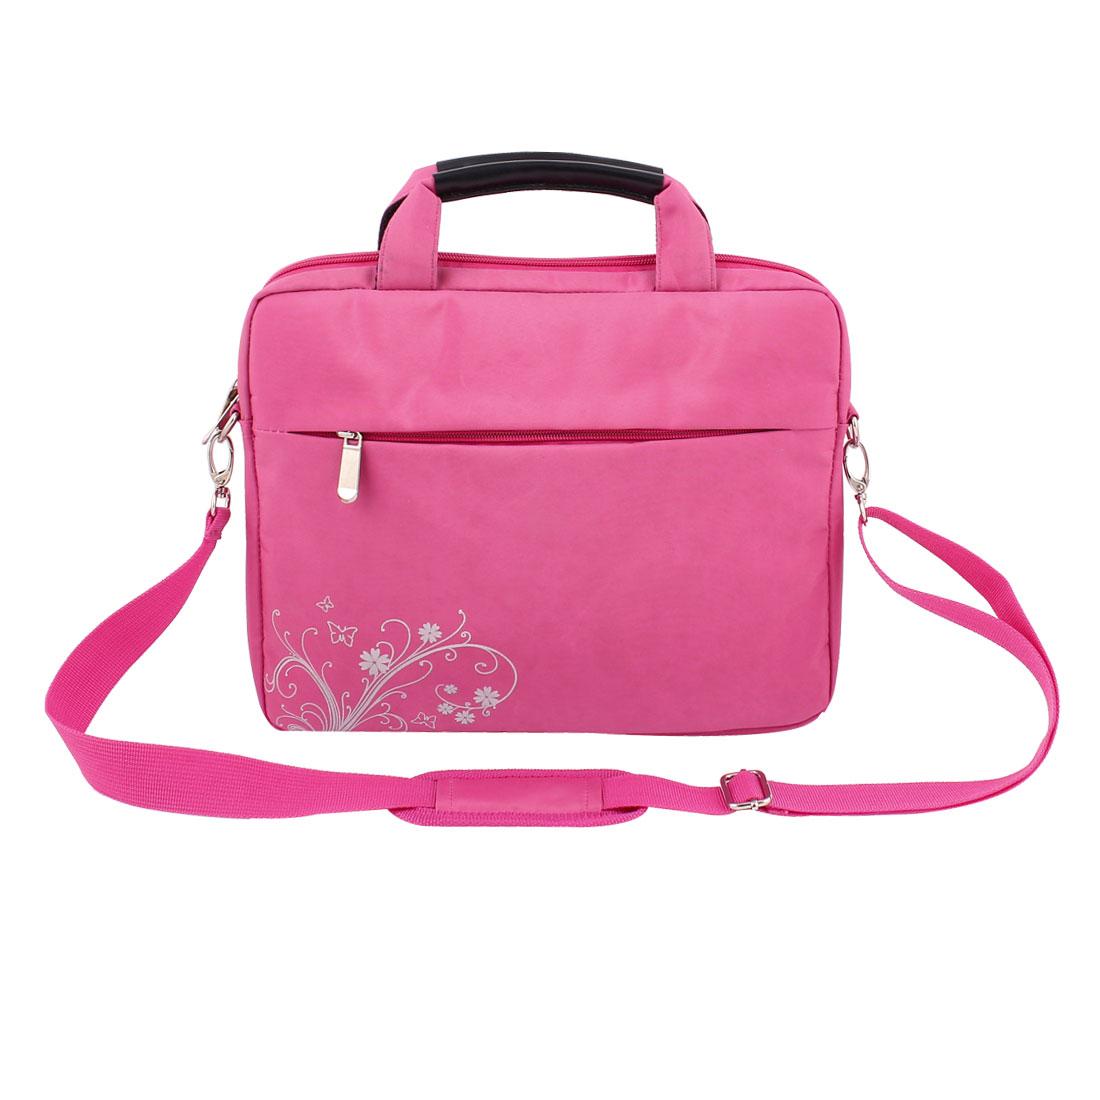 Nylon Zipper PC Laptop Notebook Handle Sleeve Case Bag Fuchsia 26cm x 31cm